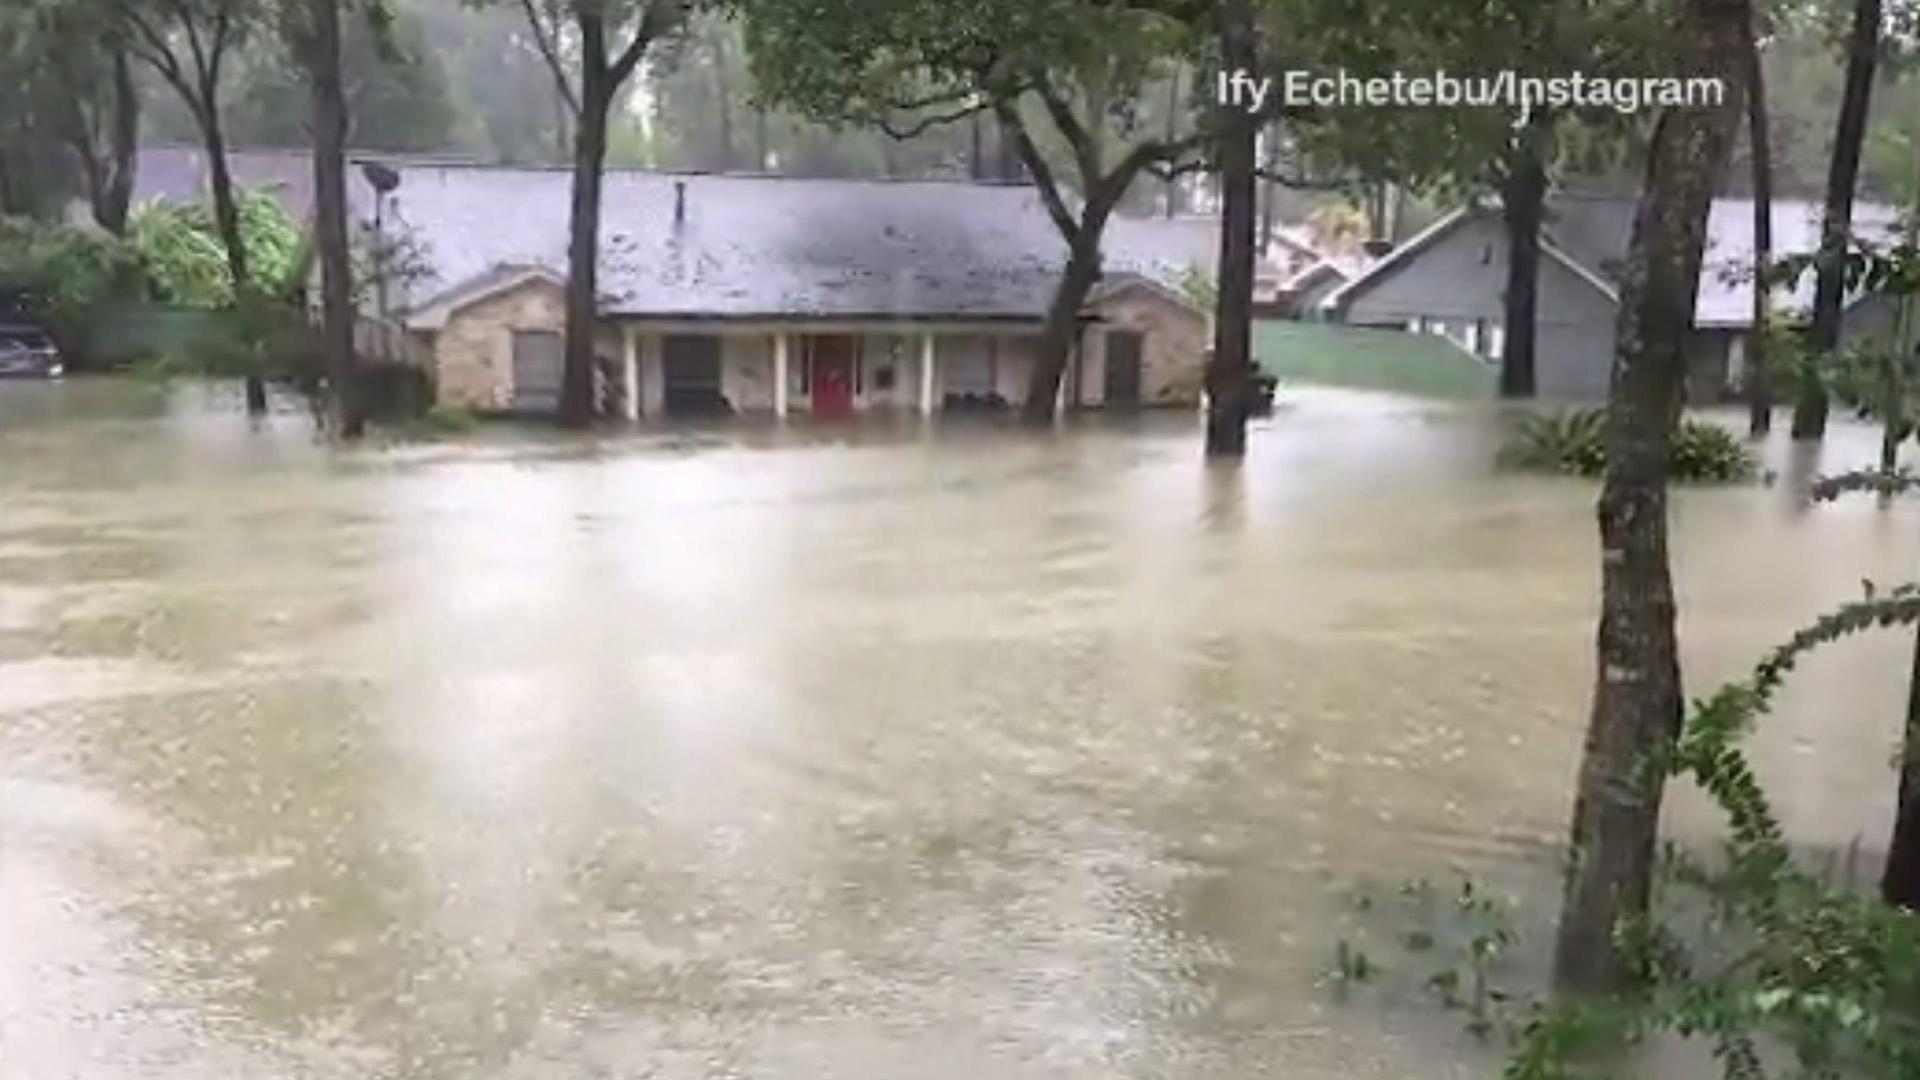 House under water, Instagram photo, Hurricane Harvey_1503854736516-159532.jpg18413010